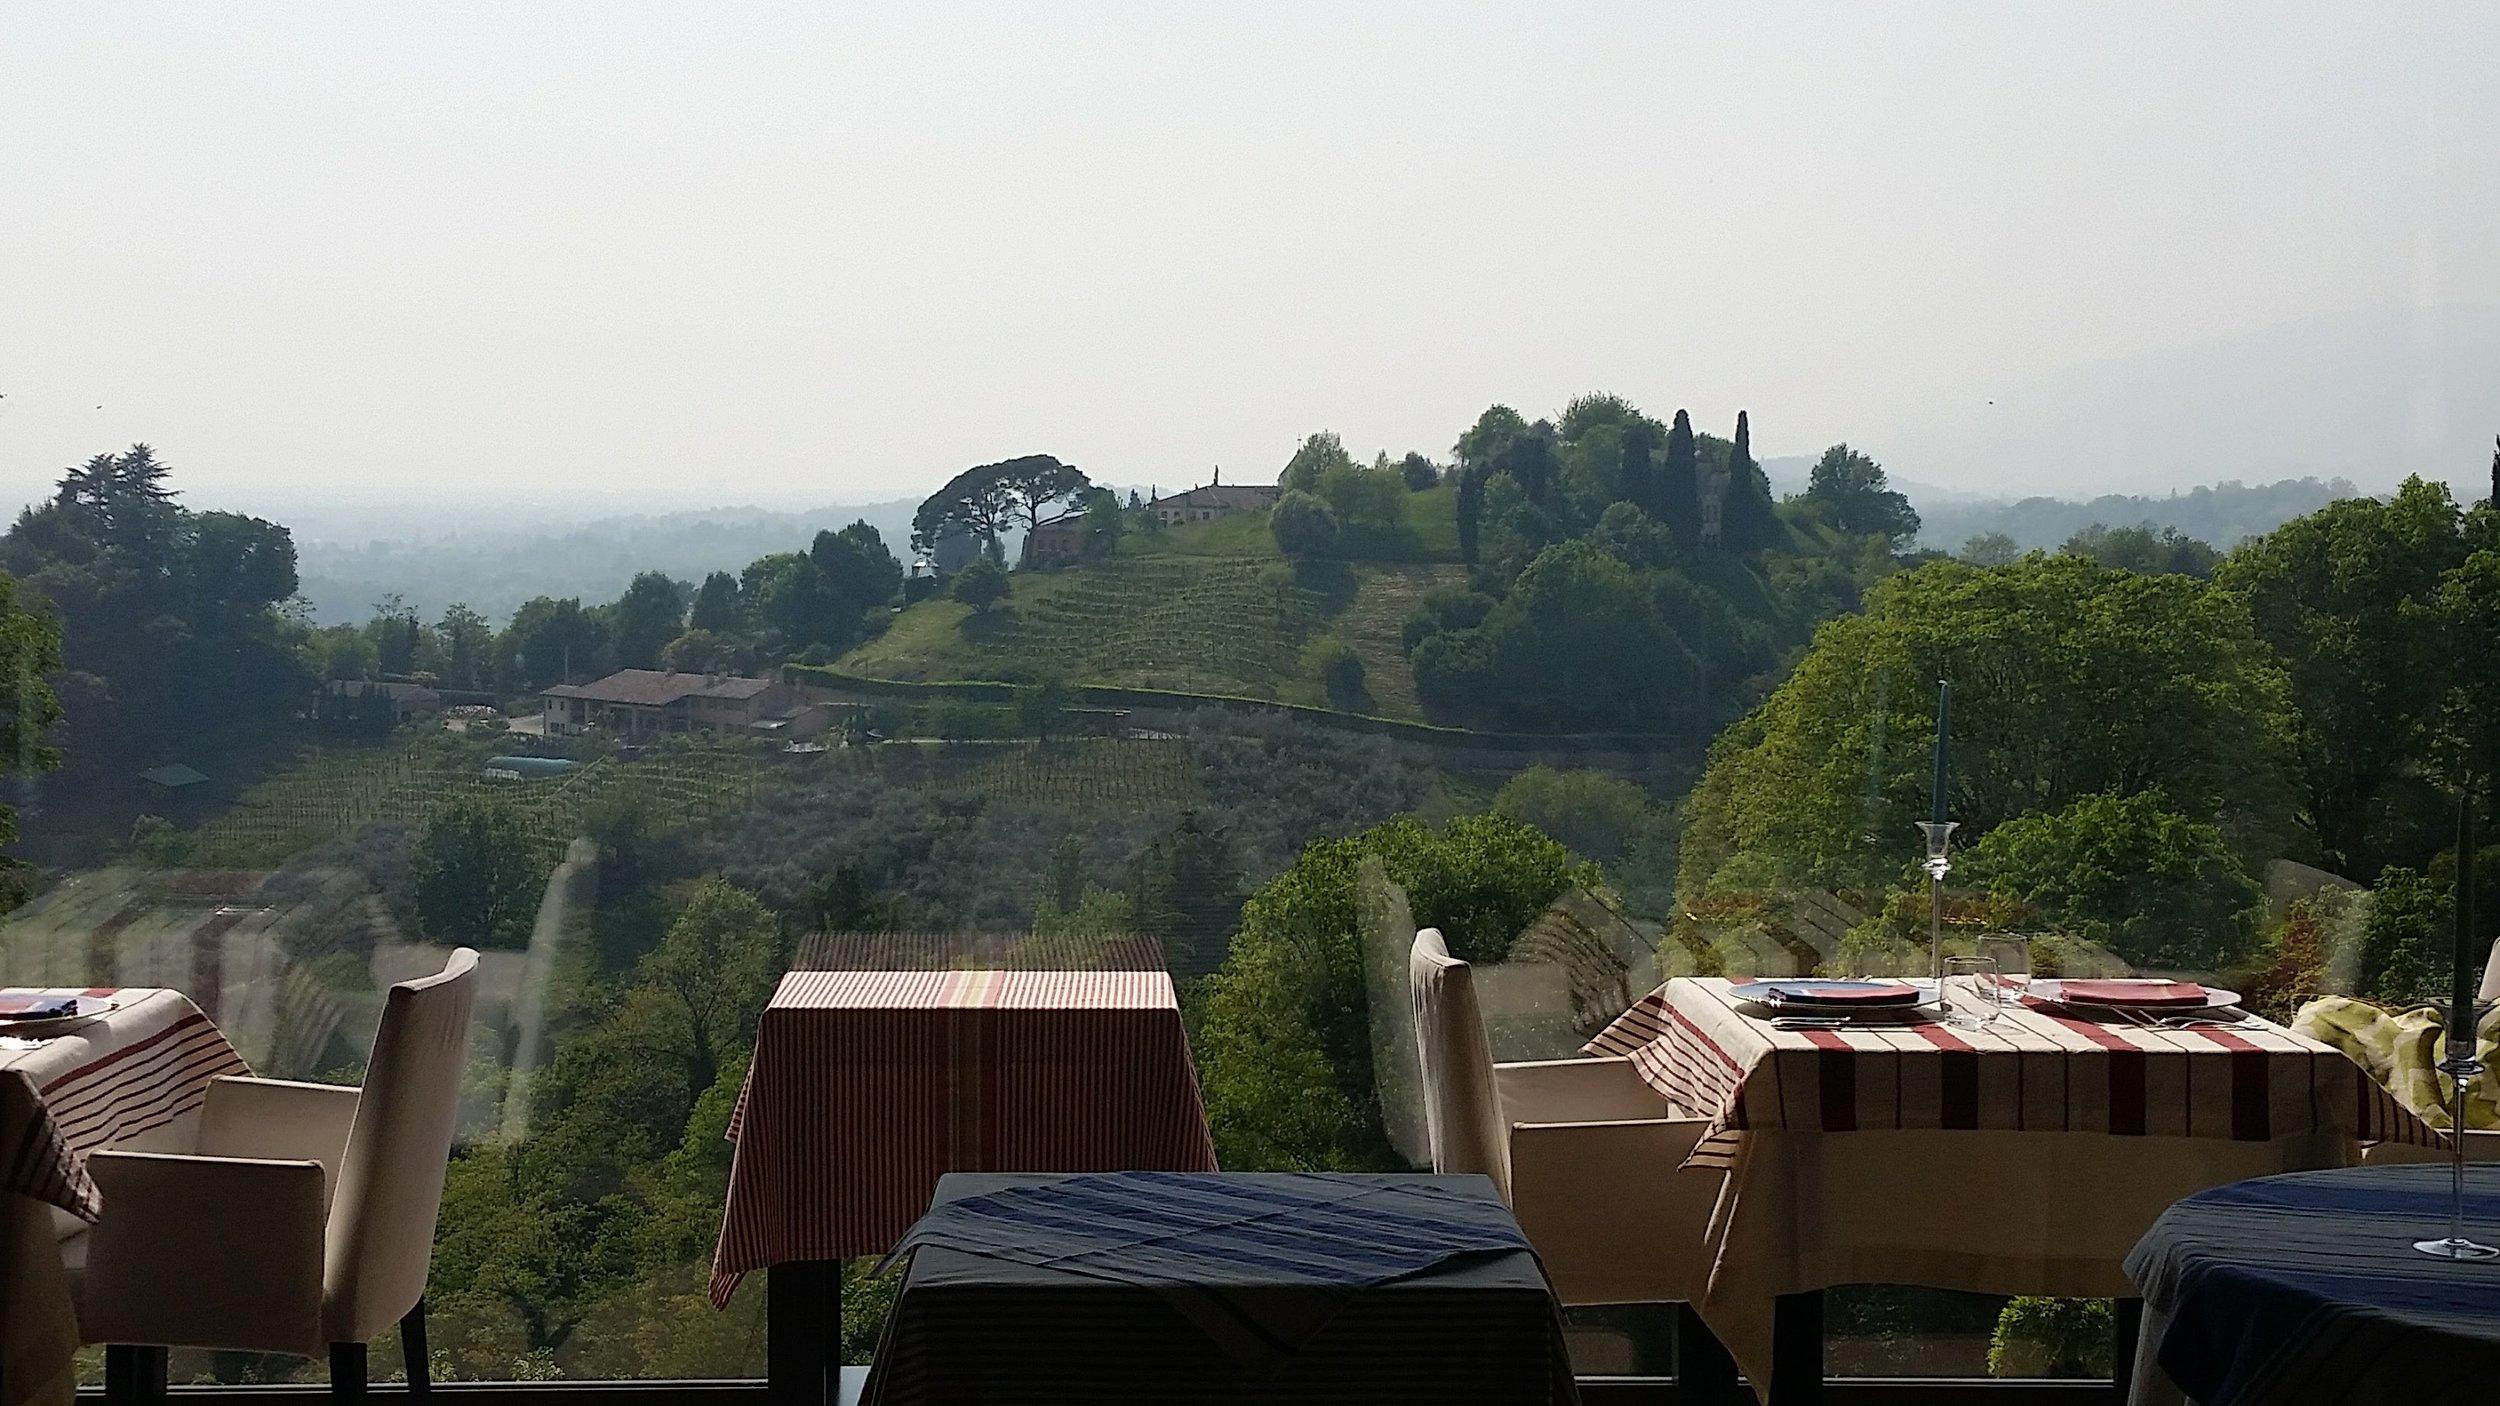 Mediterranean Lifestyle in Italy